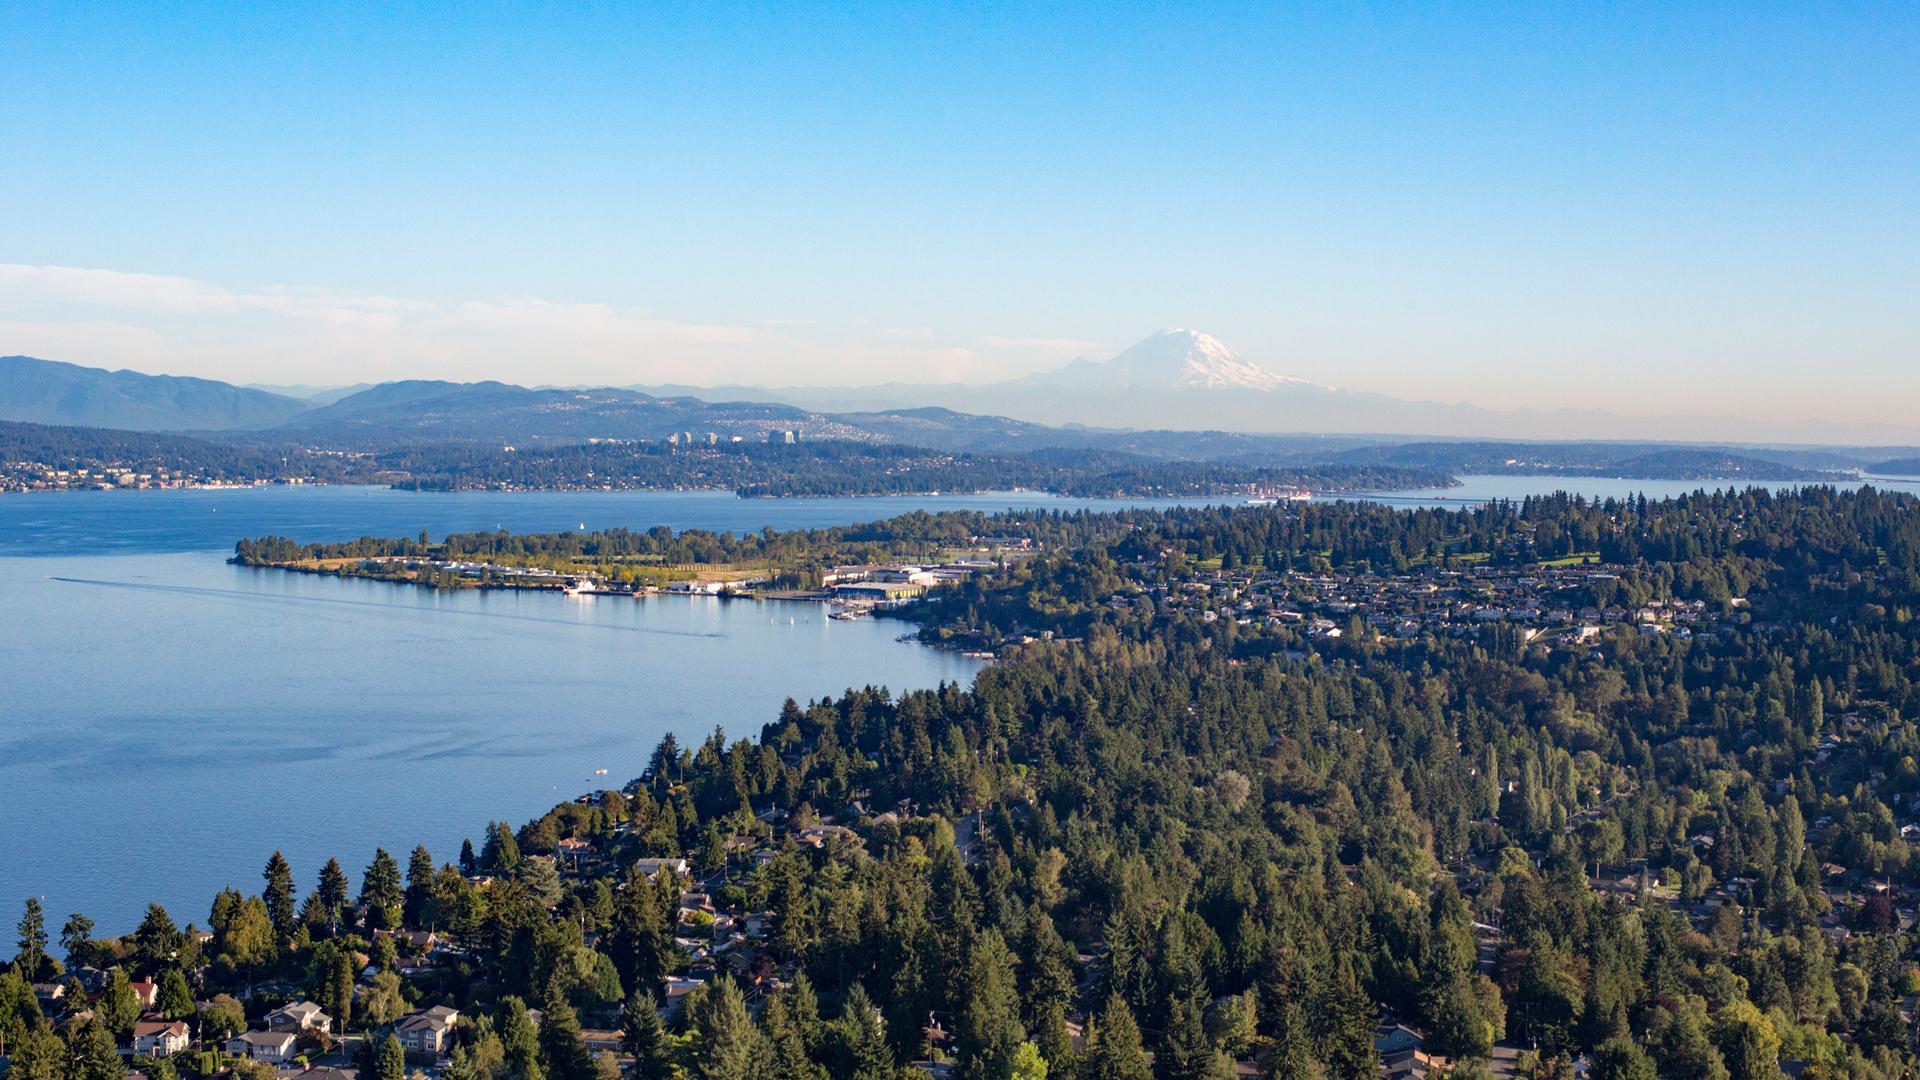 Seattle shoreline with Lake Washington and Mt. Rainier